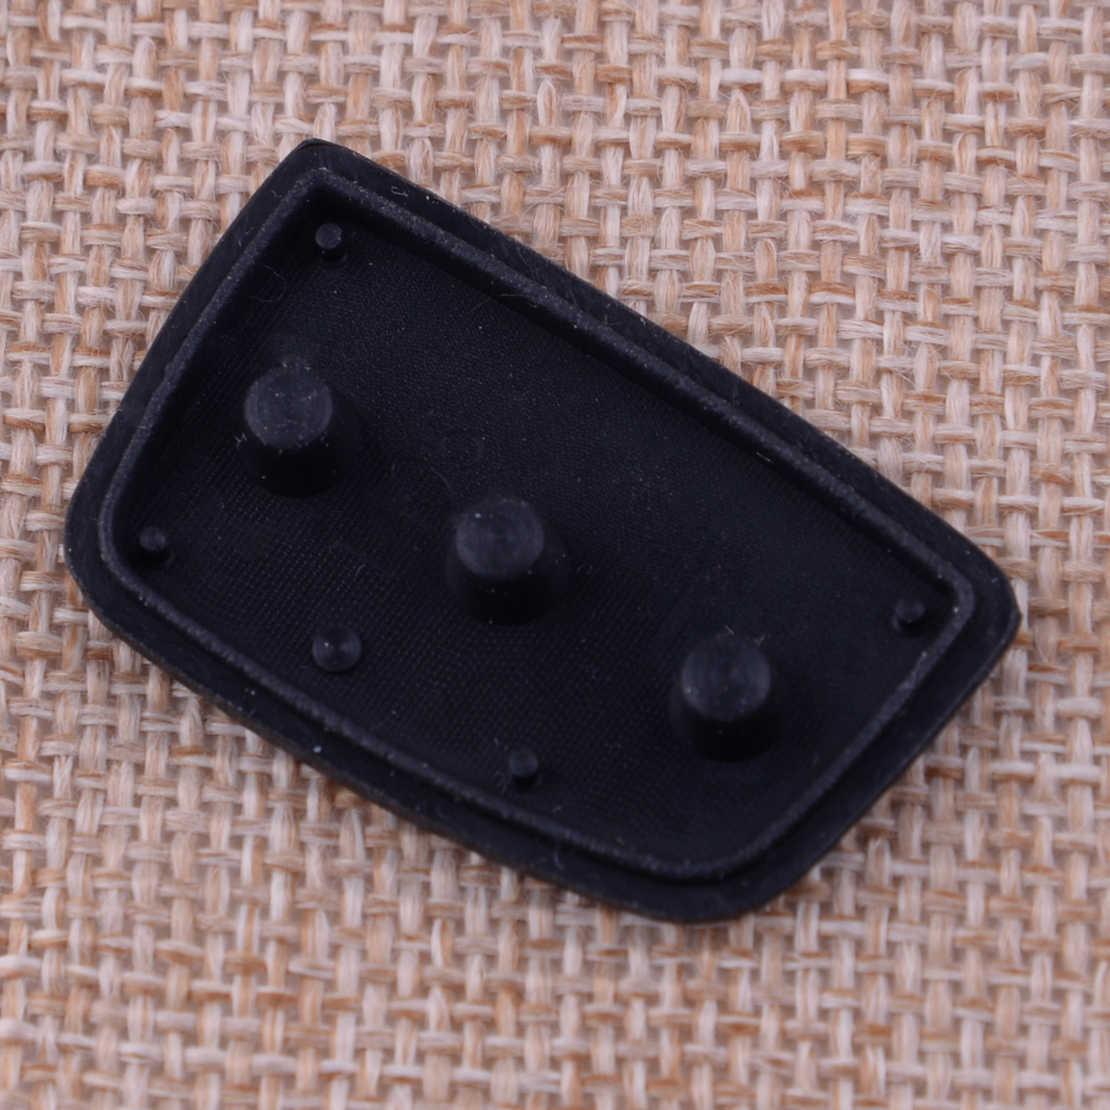 CITALL 3 boutons Silicone à distance clé bouton protection coquille Fob ajustement pour Hyundai Tucson Santa fe Creta Elantra I20 2013-2019